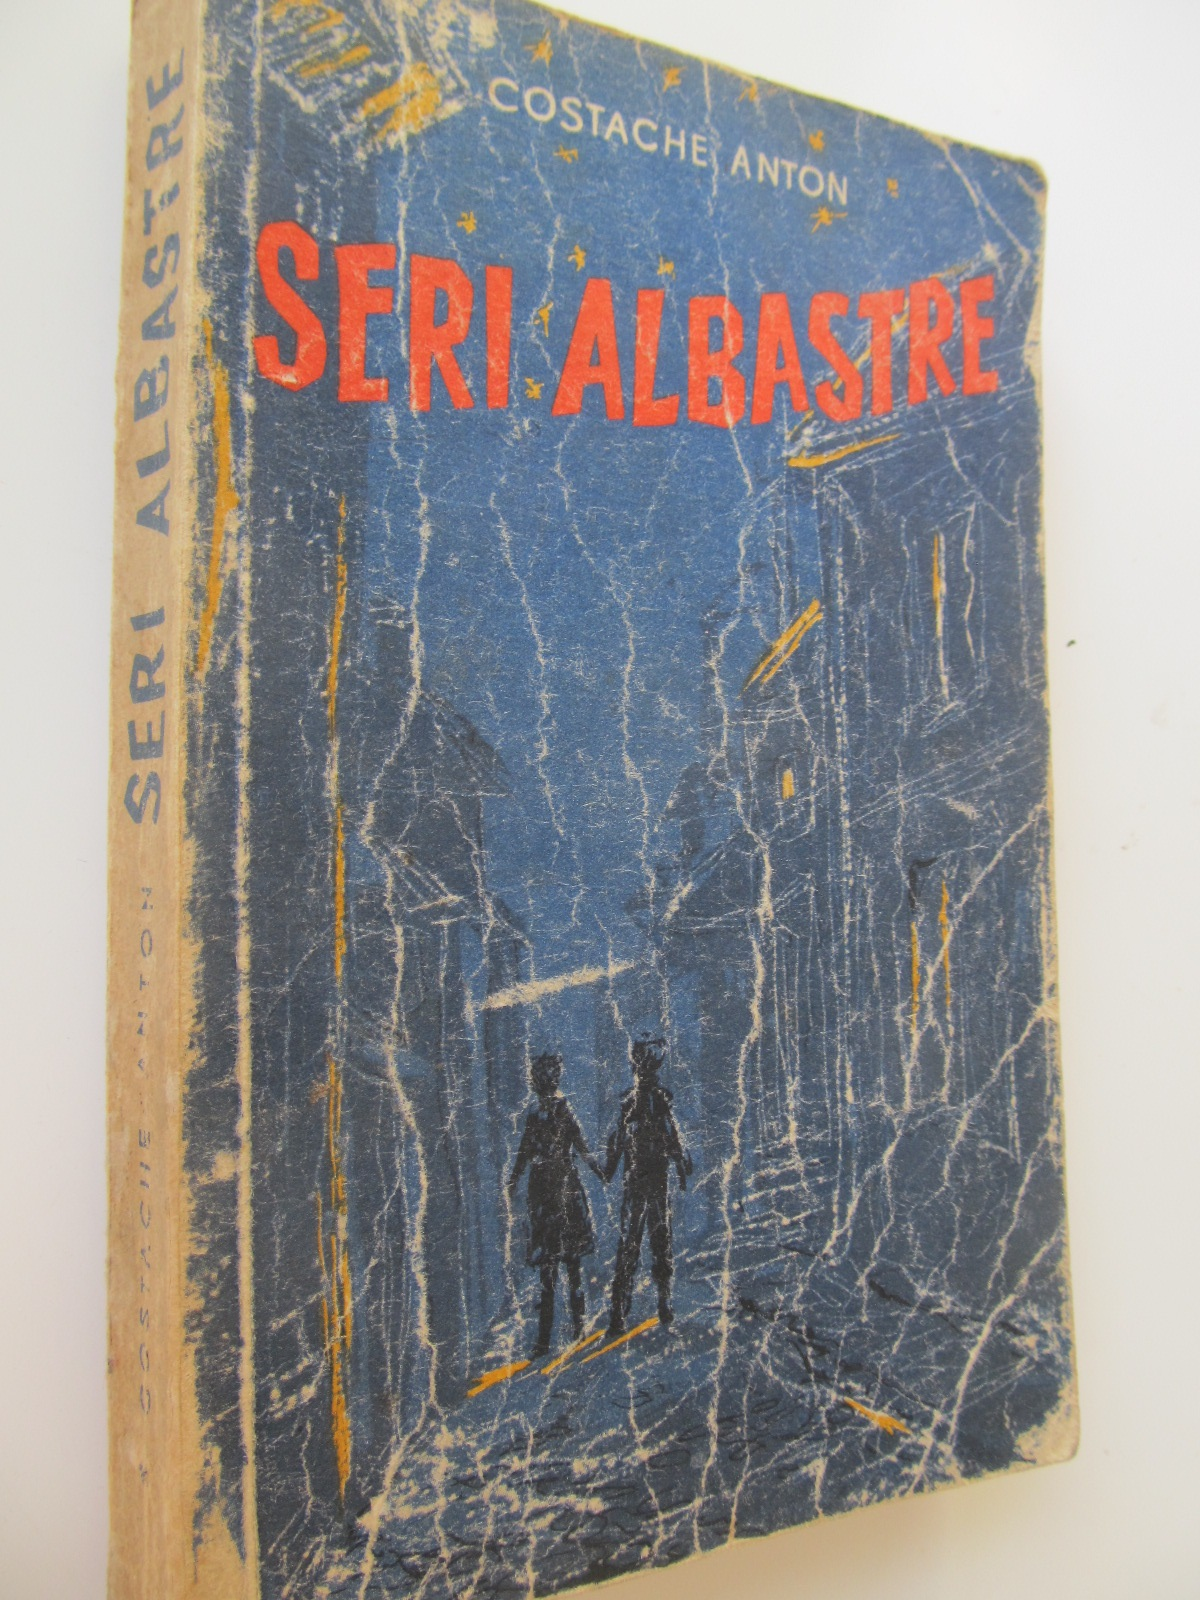 Seri albastre - Costache Anton | Detalii carte